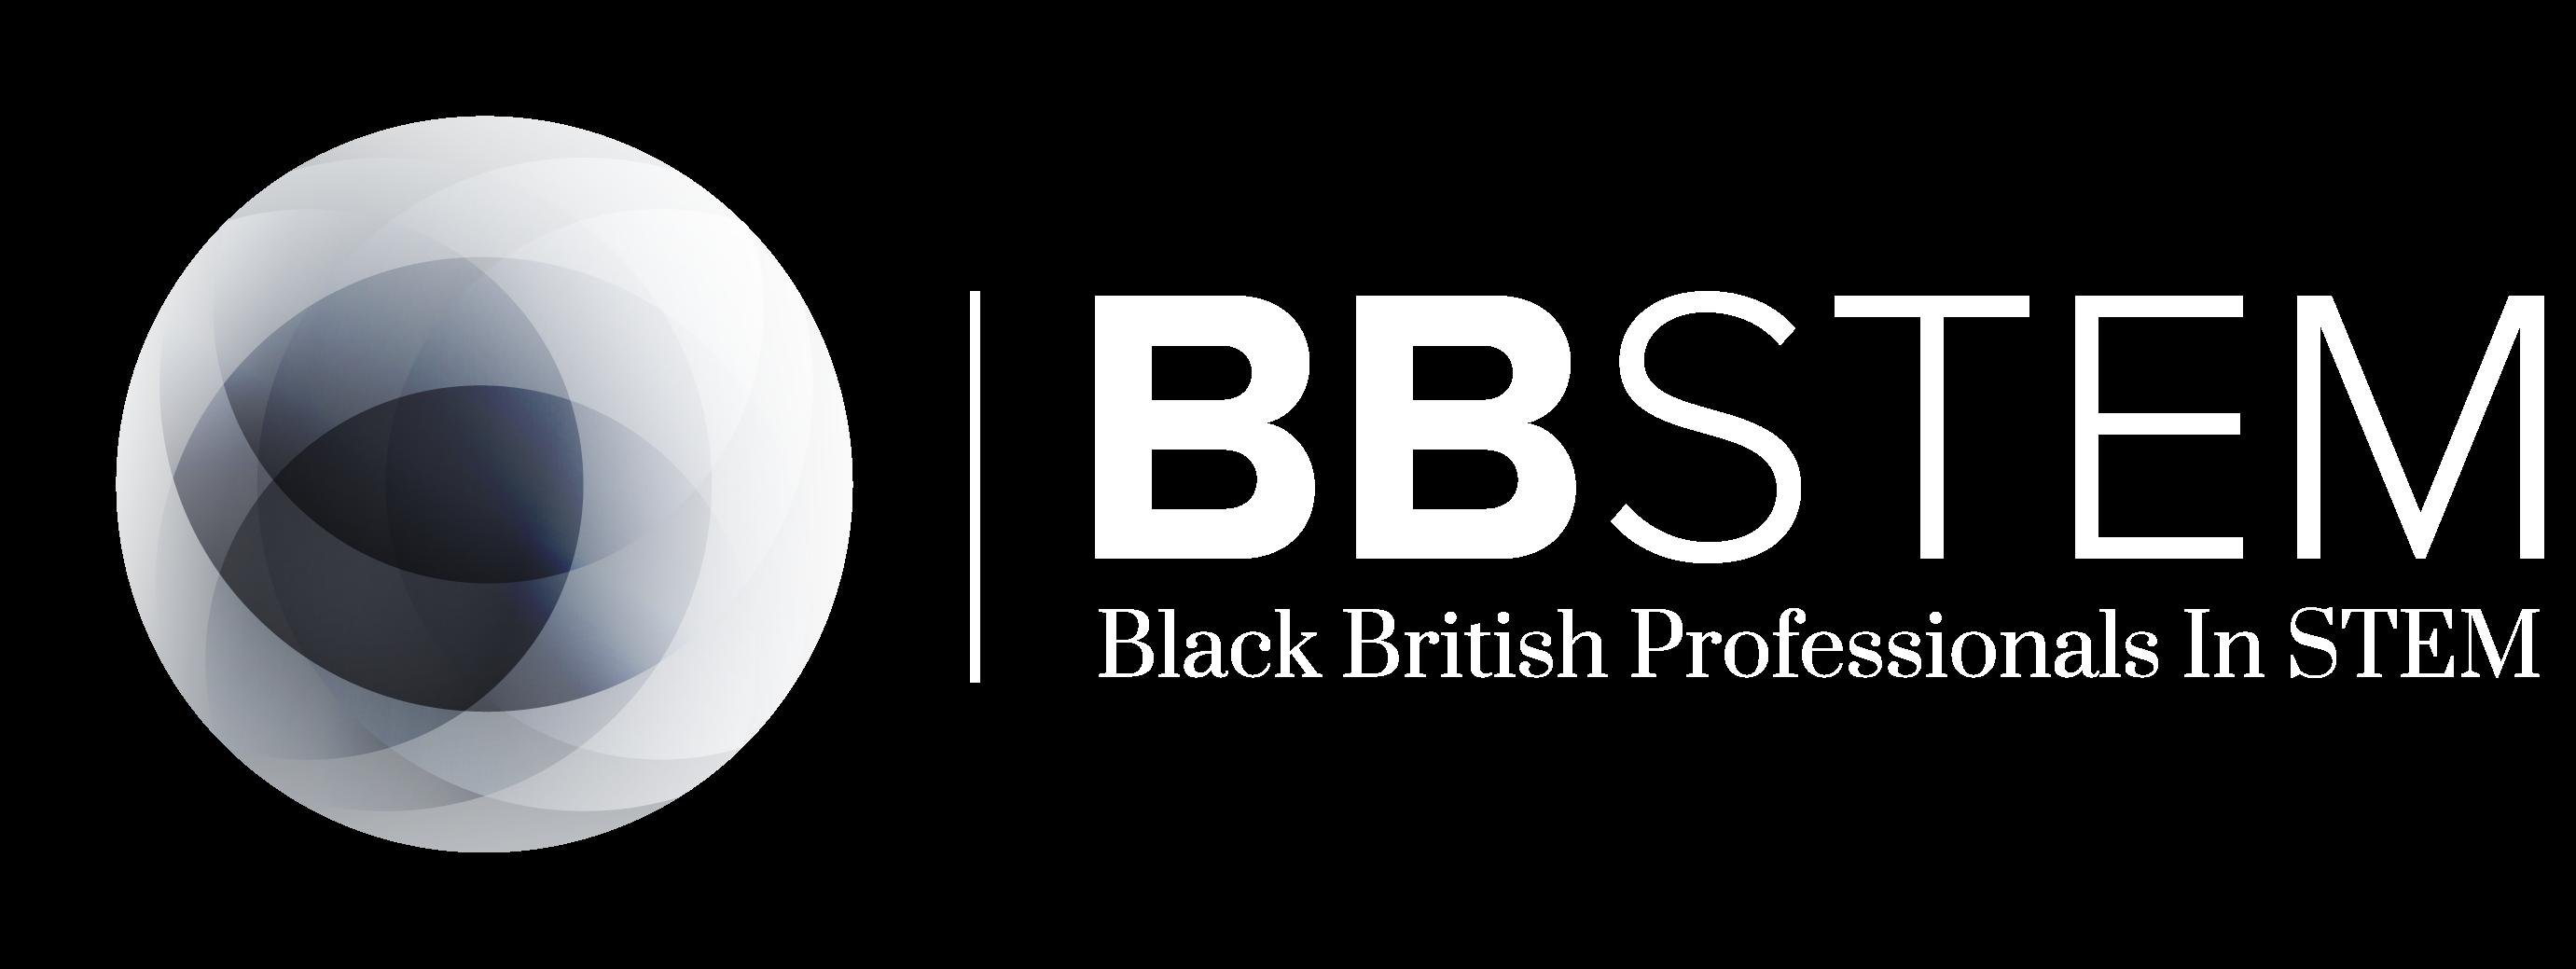 BBSTEM - Black British Professionals in Science, Technology, Engineering & Maths